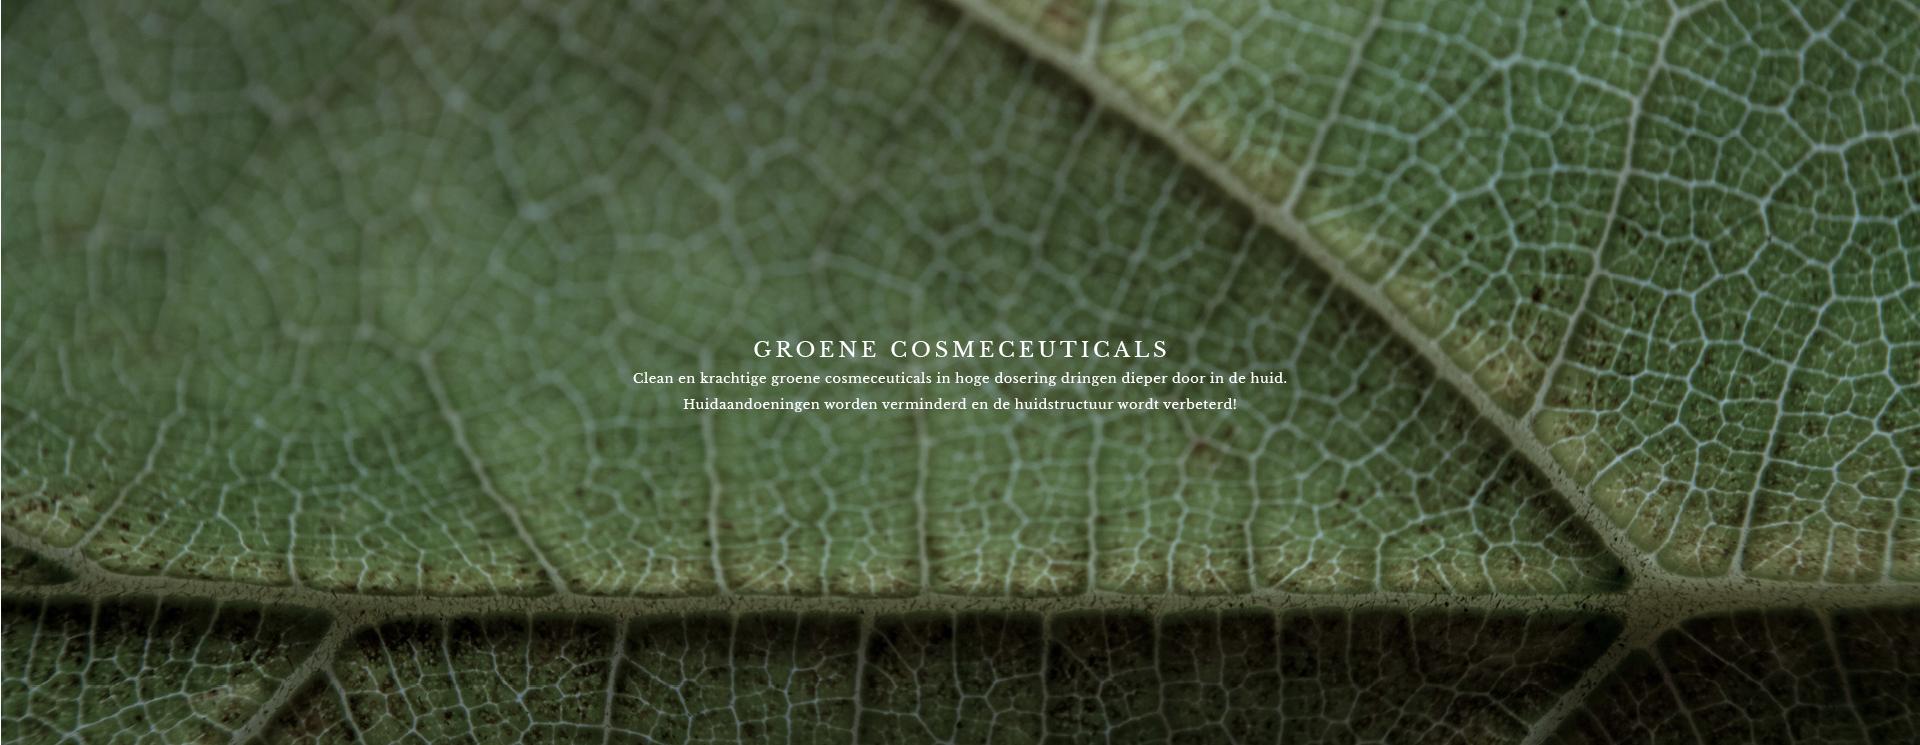 groene cosmeceuticals